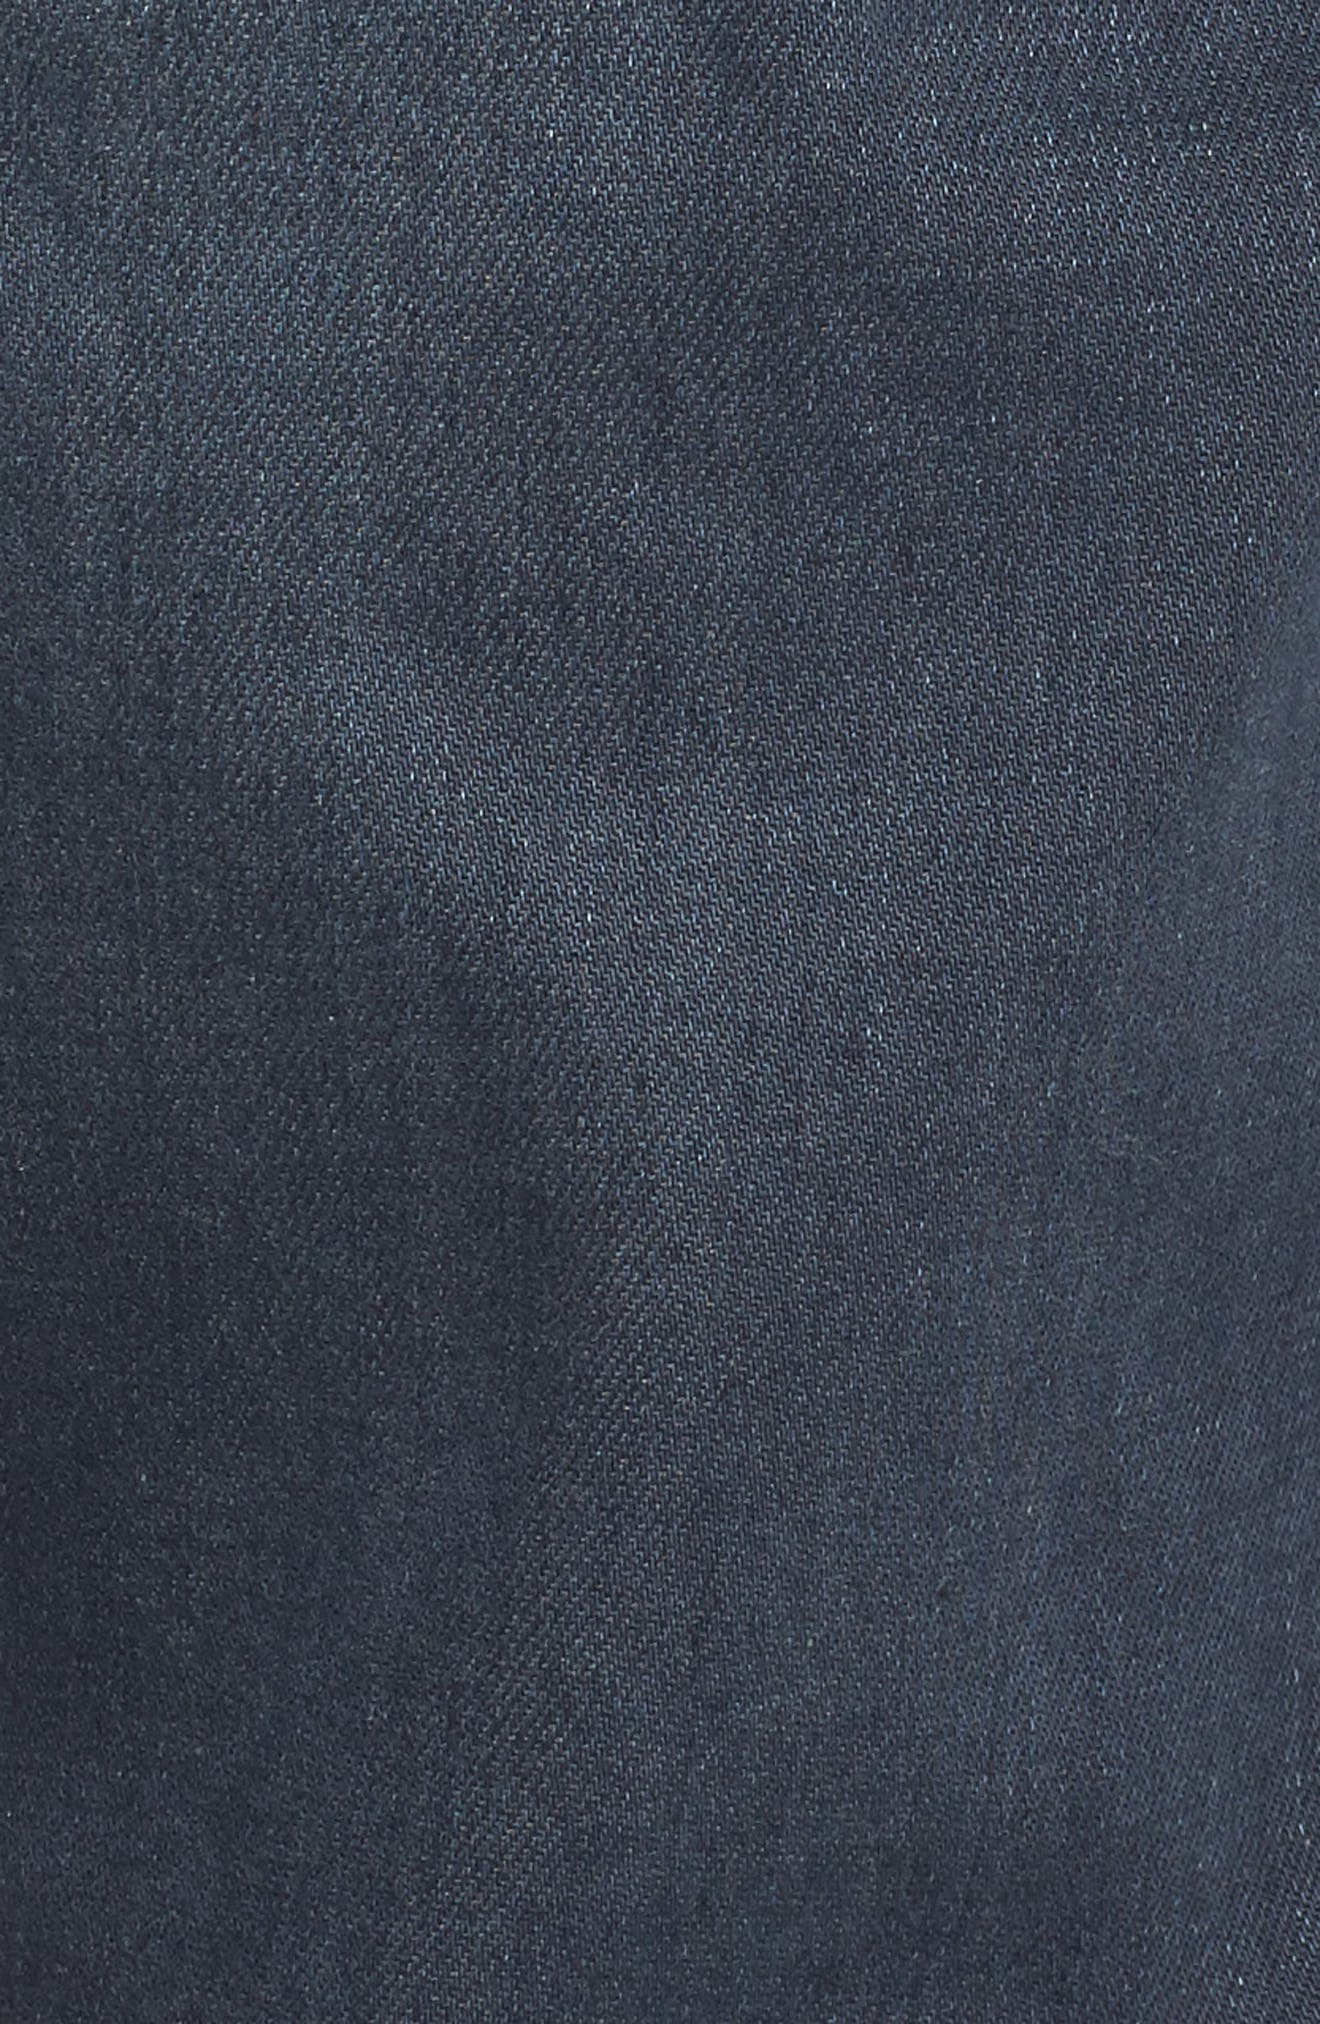 Dylan Skinny Fit Jeans,                             Alternate thumbnail 5, color,